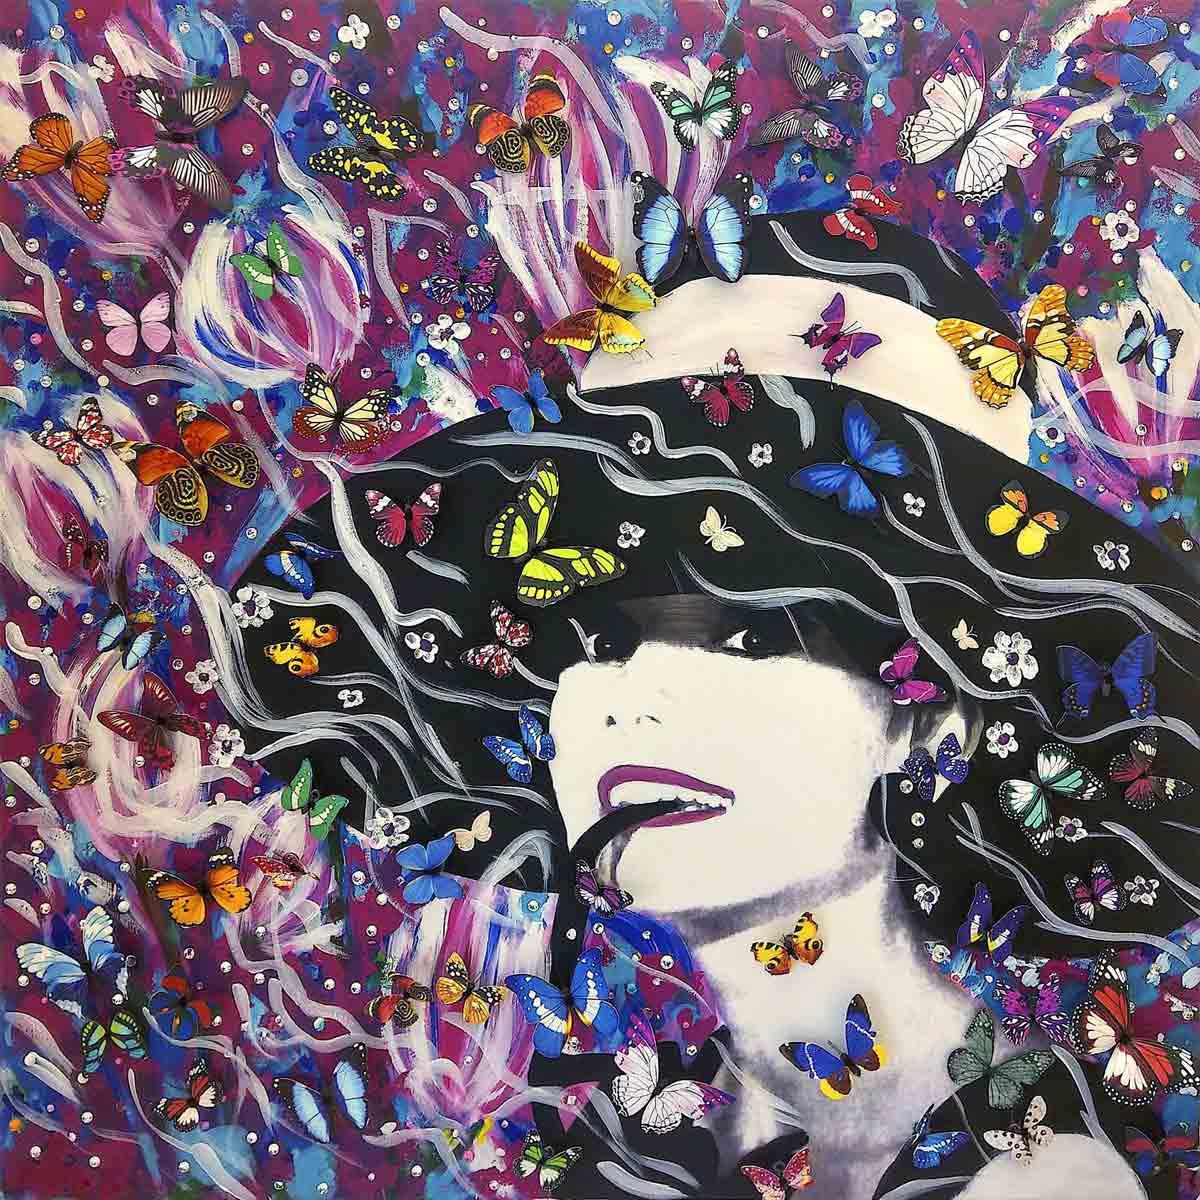 Contemporary Artist Cornelia Hagmann La Galleria Fine Art Prints, Seidenschal, sciarpa di seta, foulard soie,